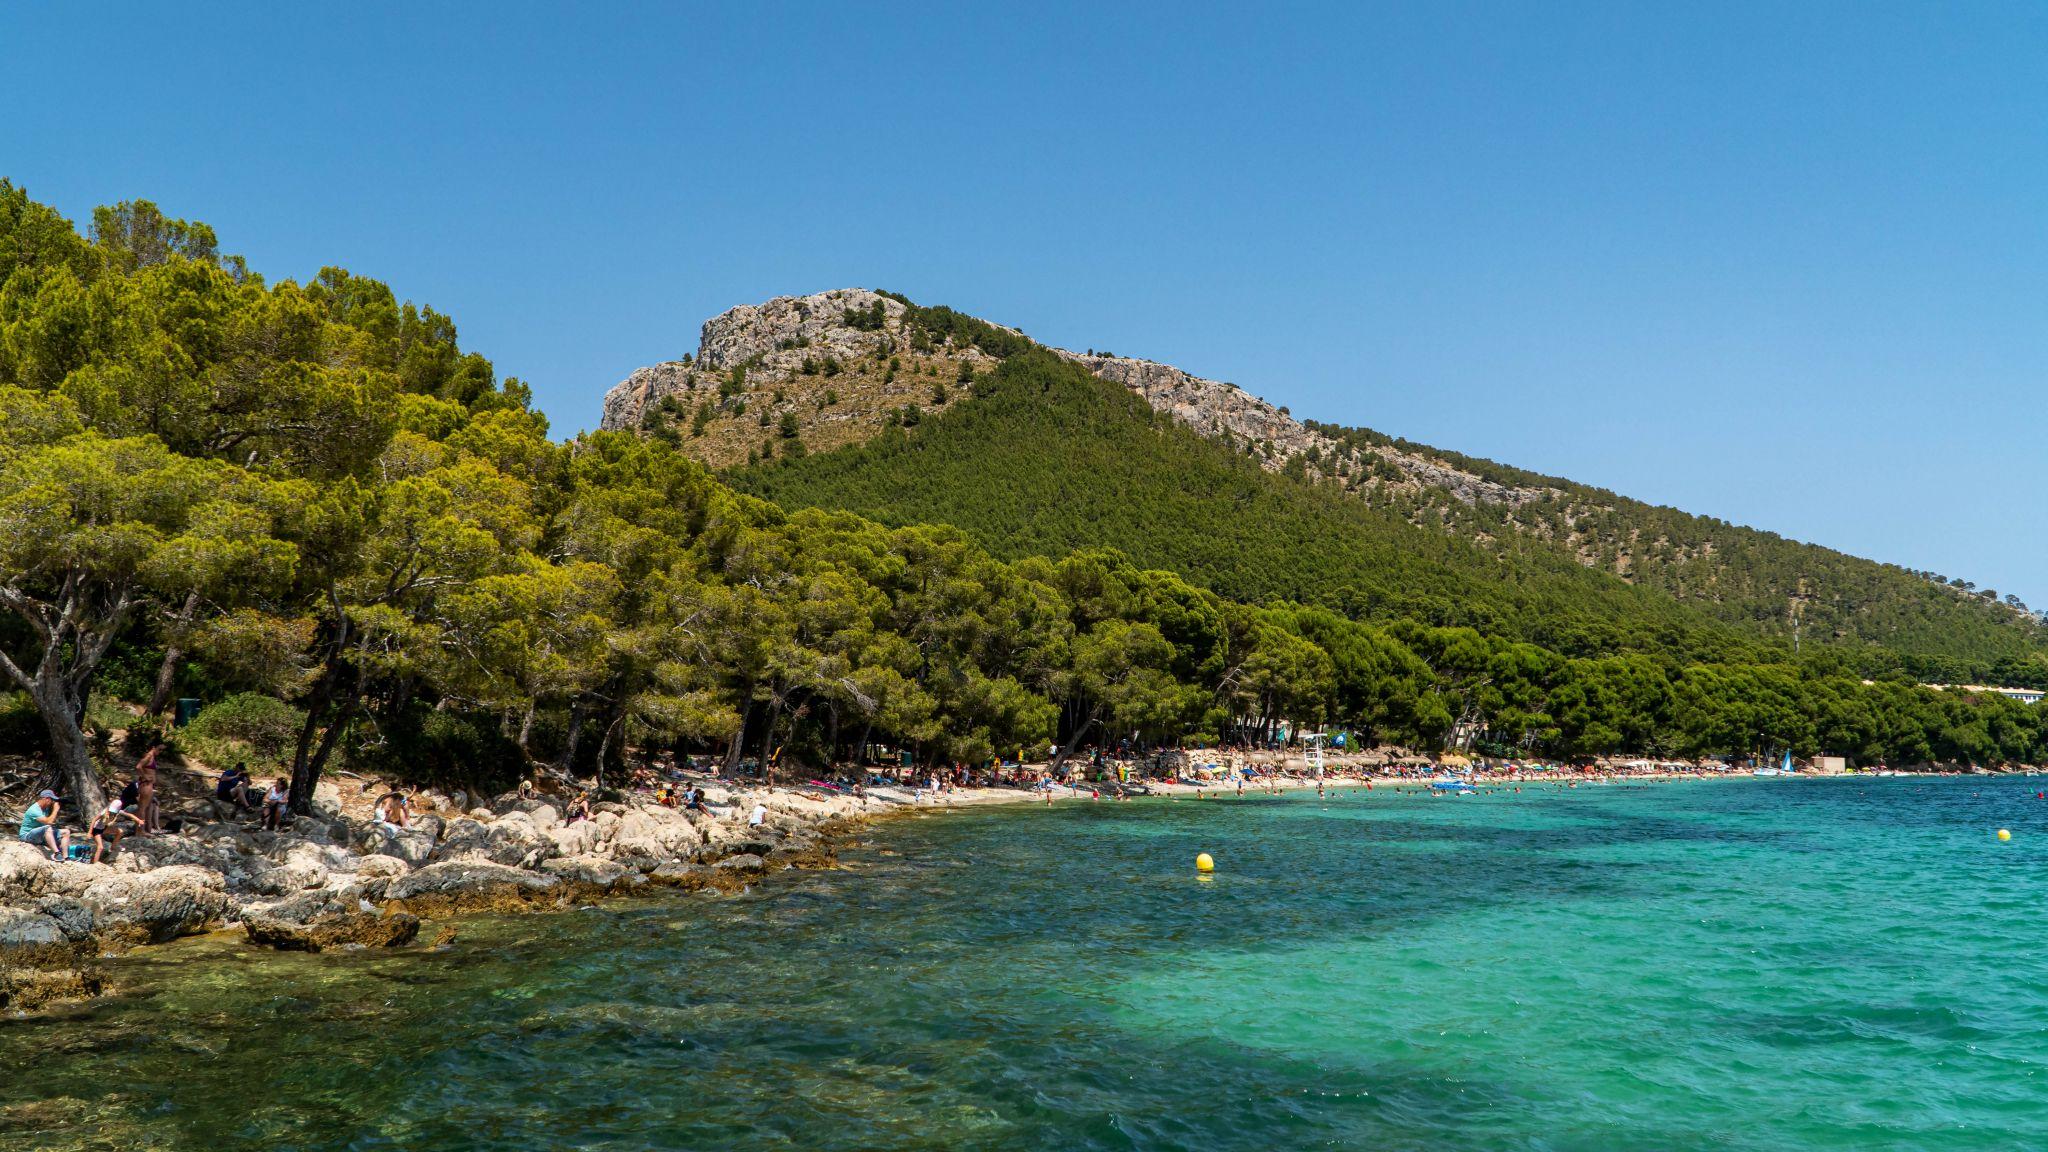 Platja de Formentor, Spain